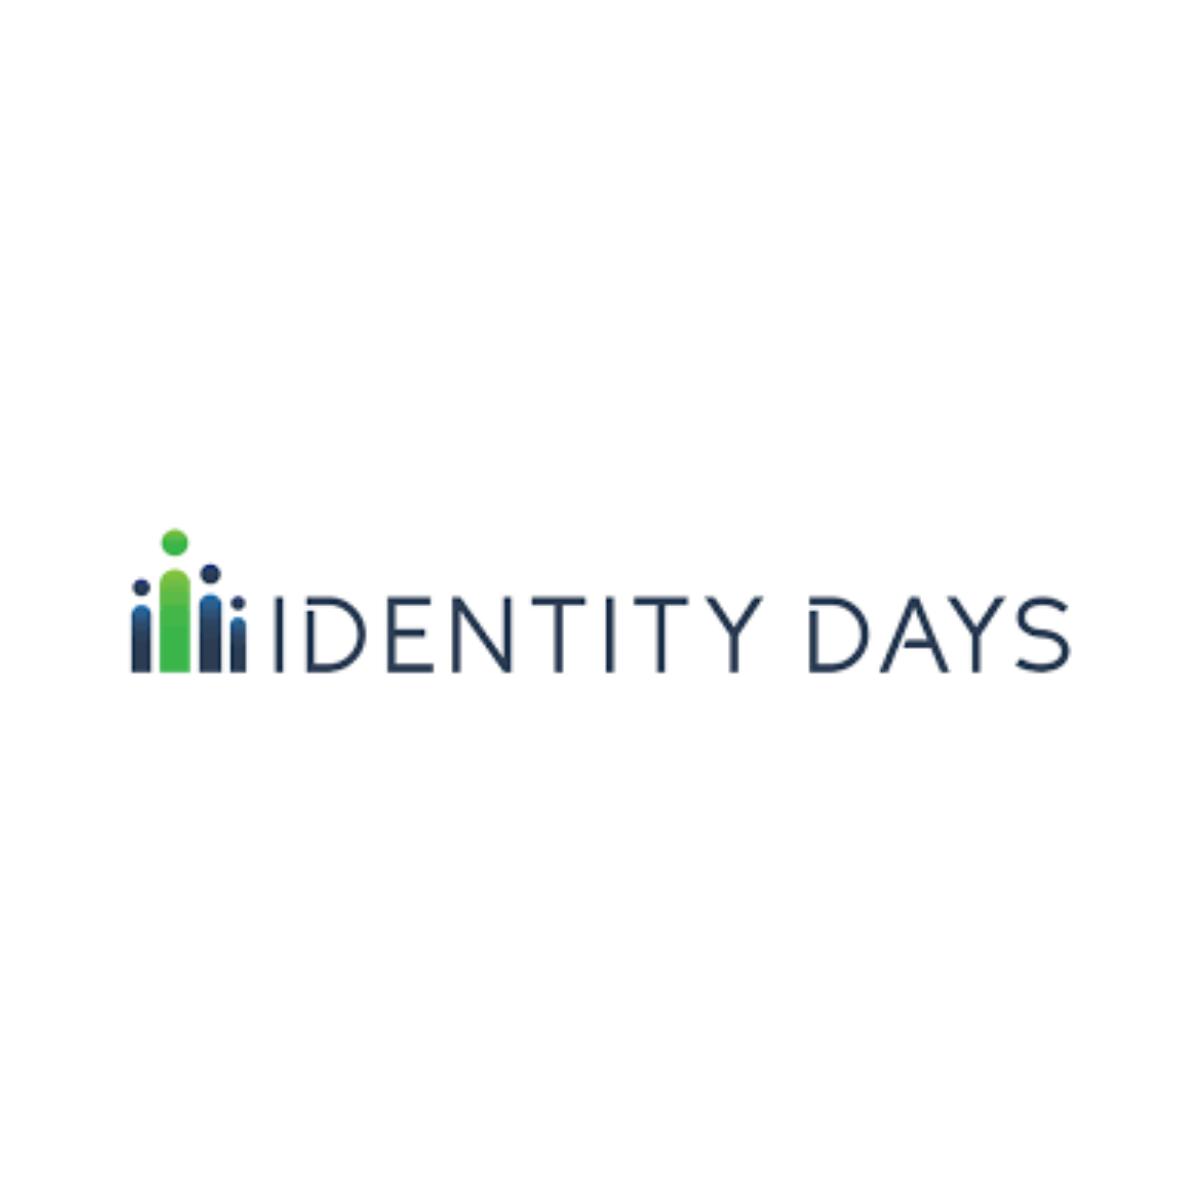 Identity Days 2021